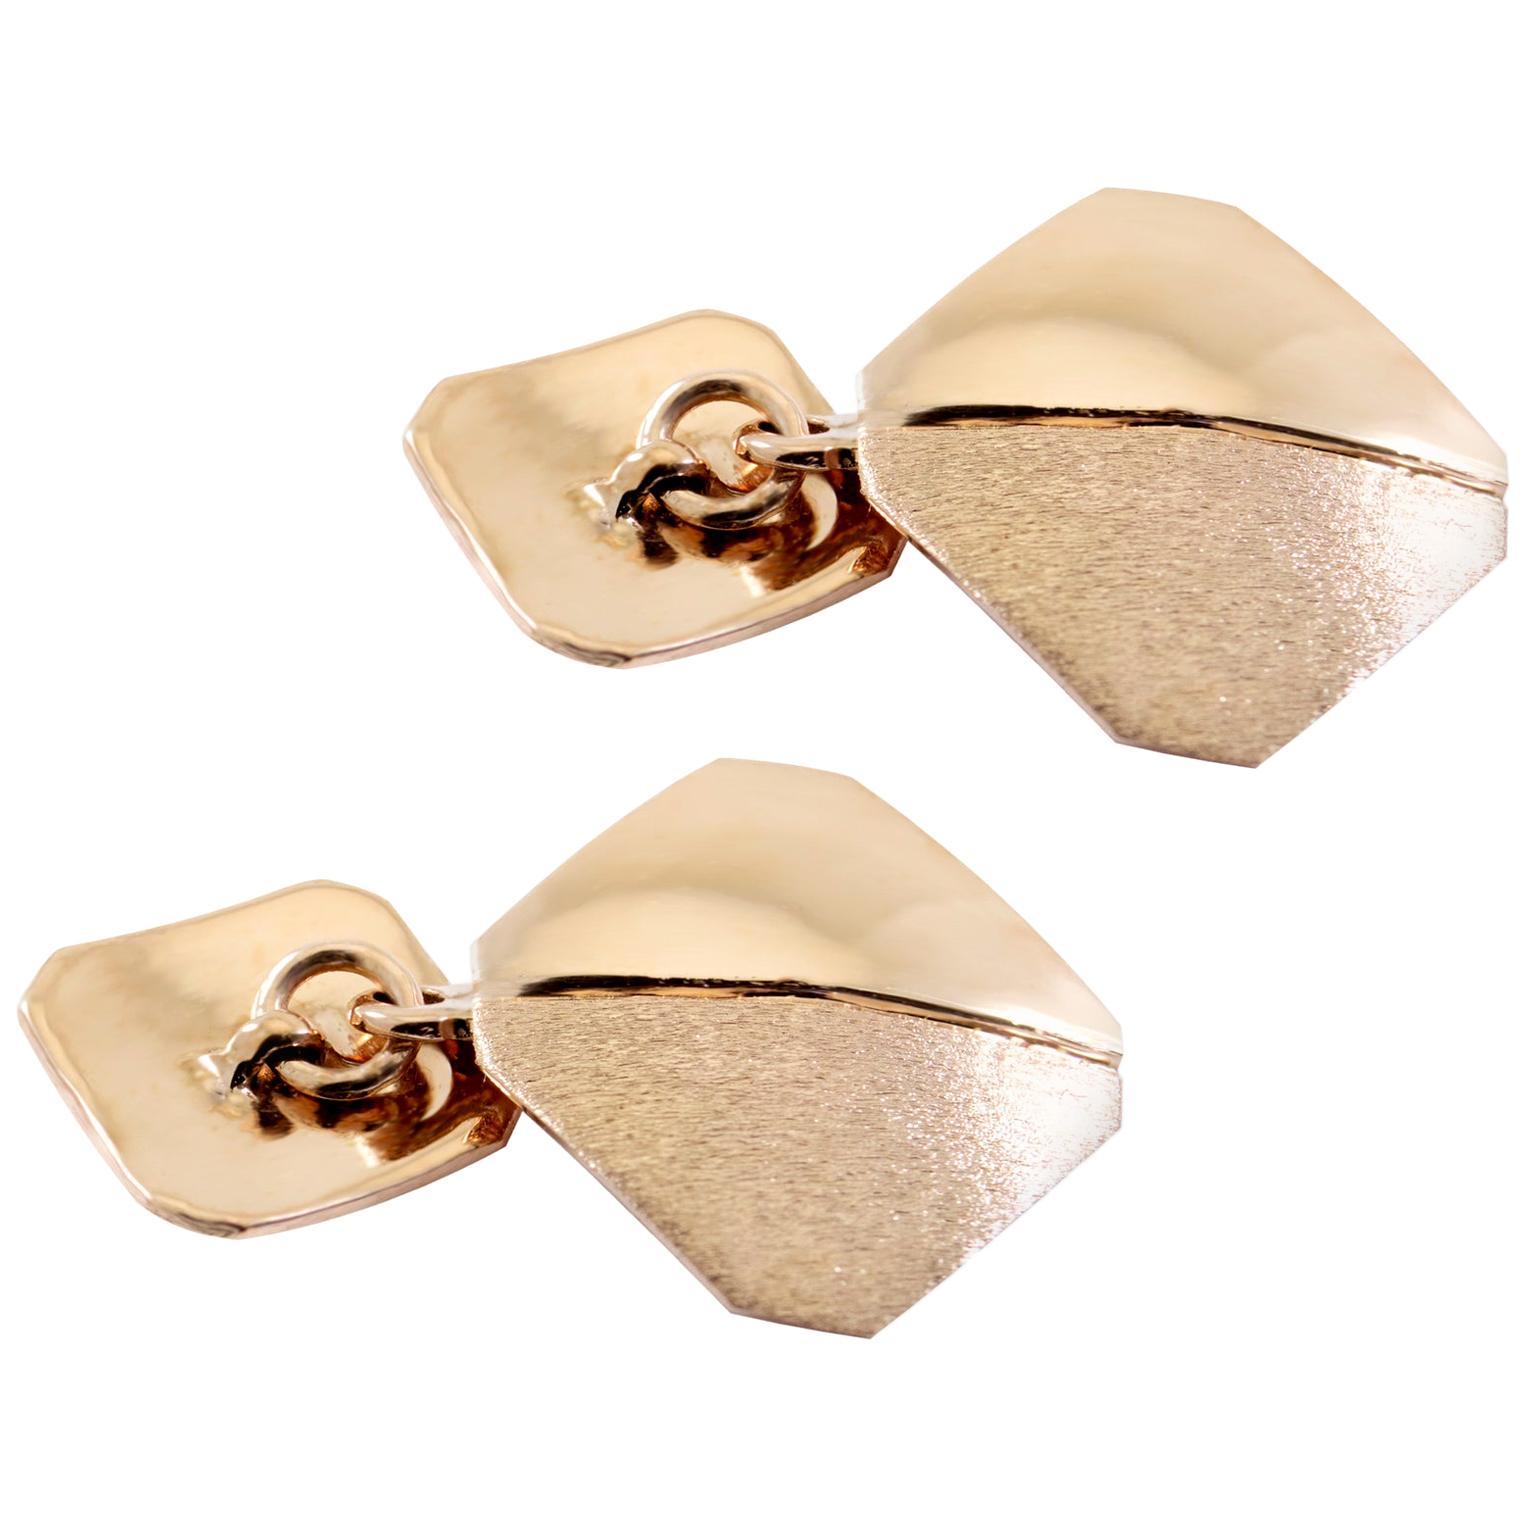 18 Karat Italian Rose Gold Brushed Cufflinks Handmade in Italy